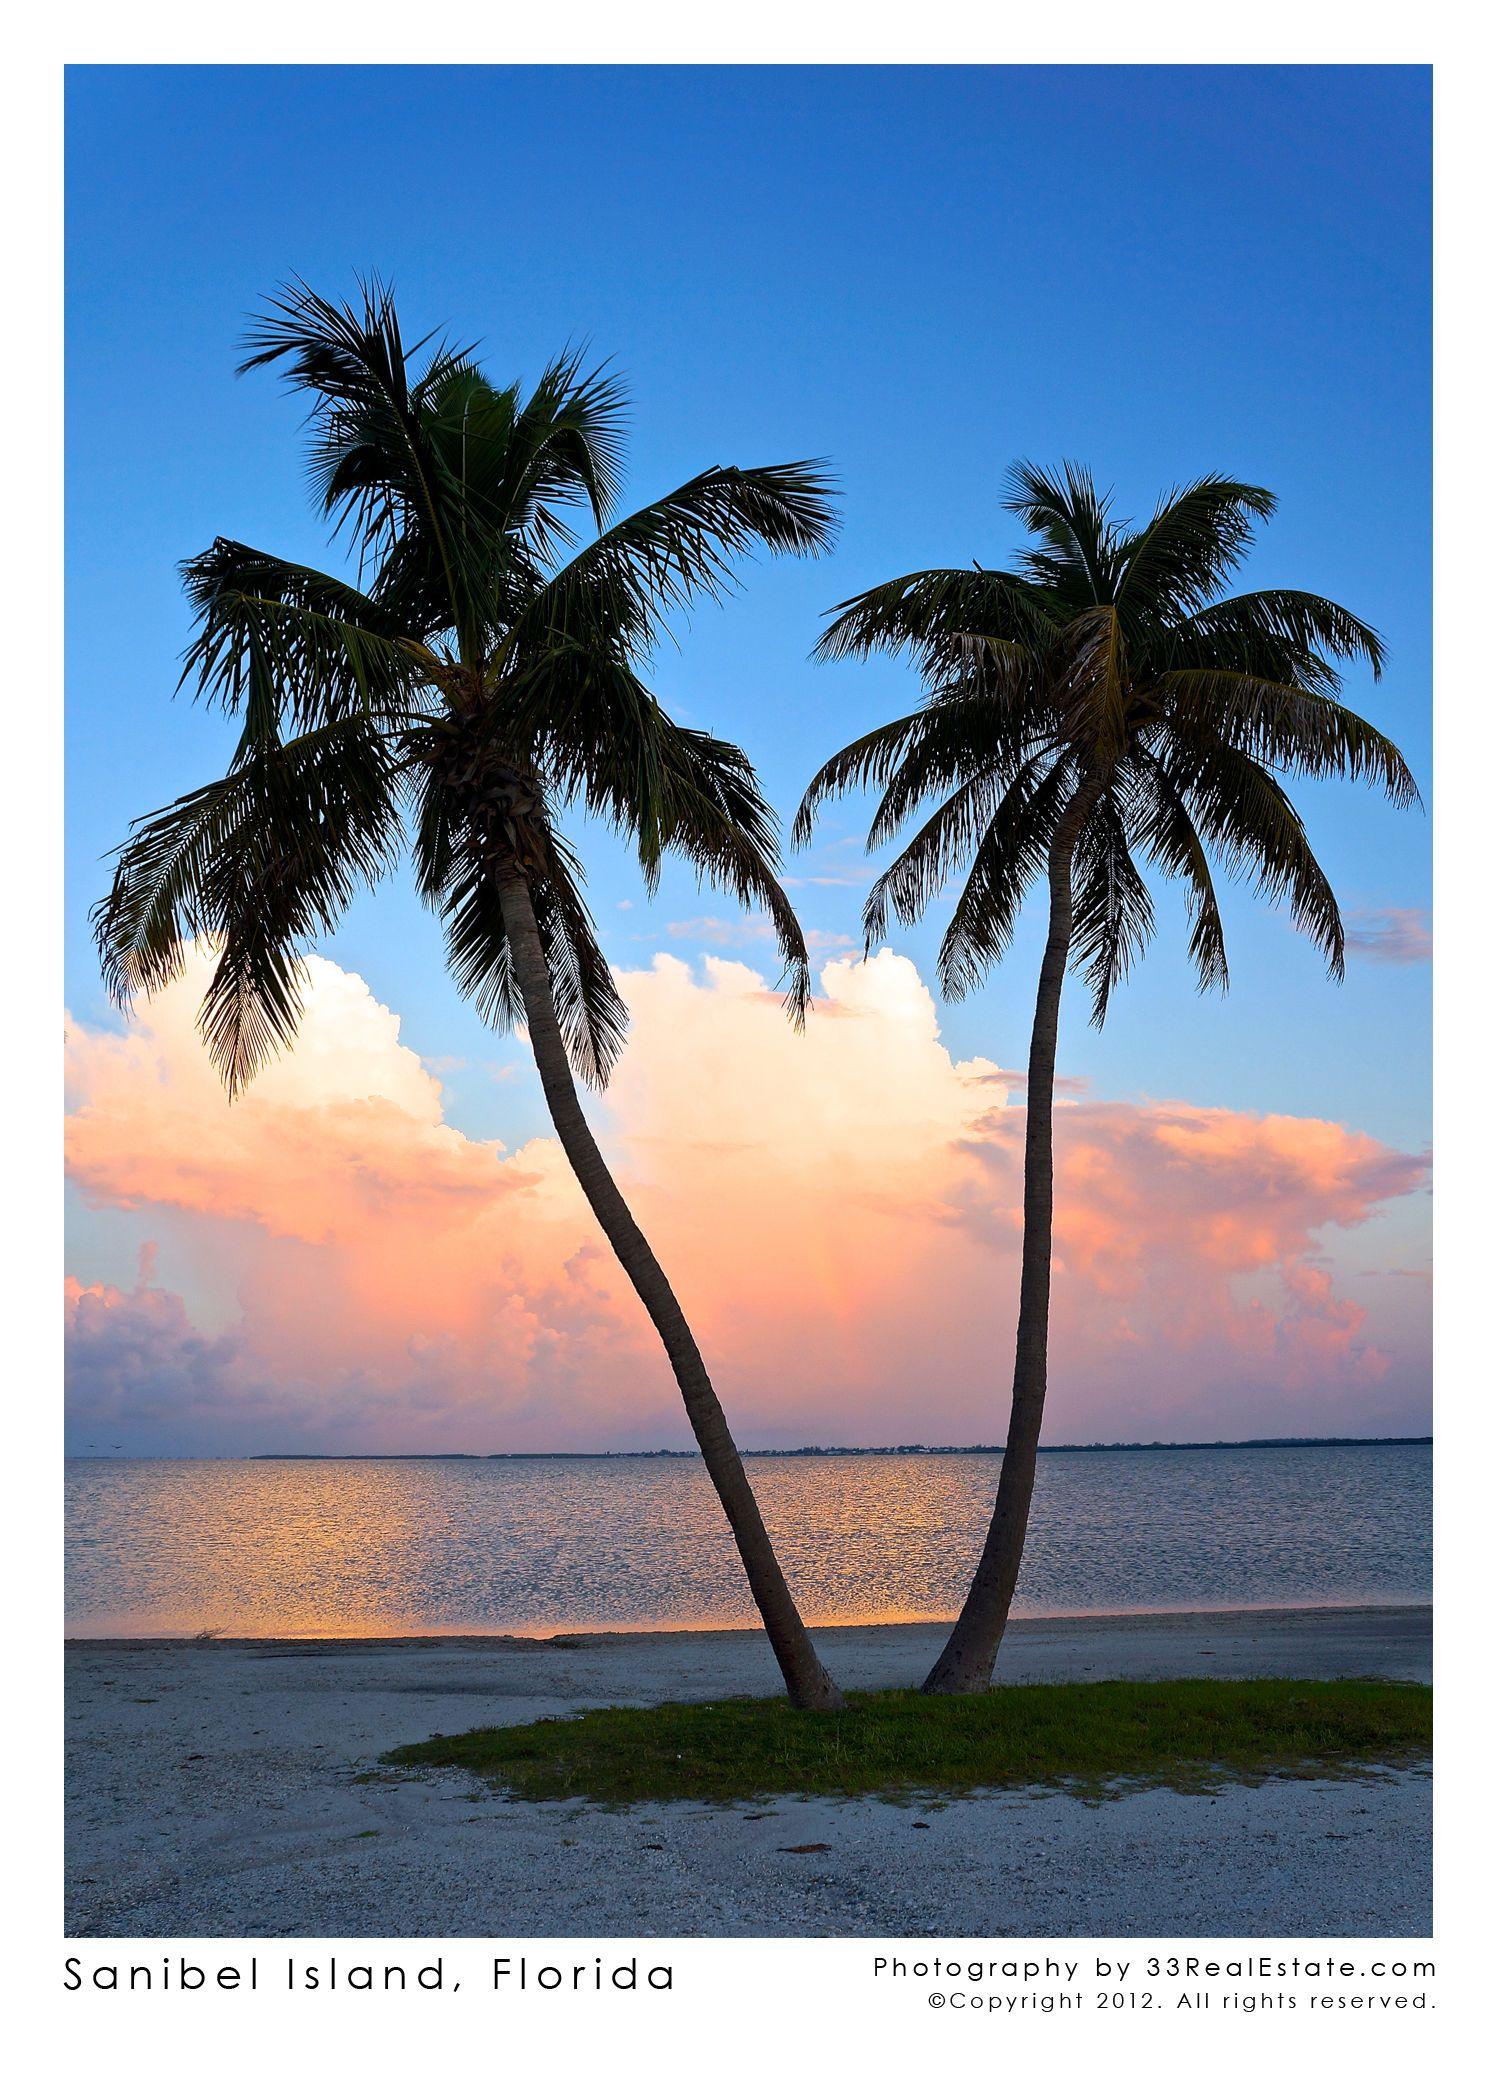 Sanibel Island, Florida #travel